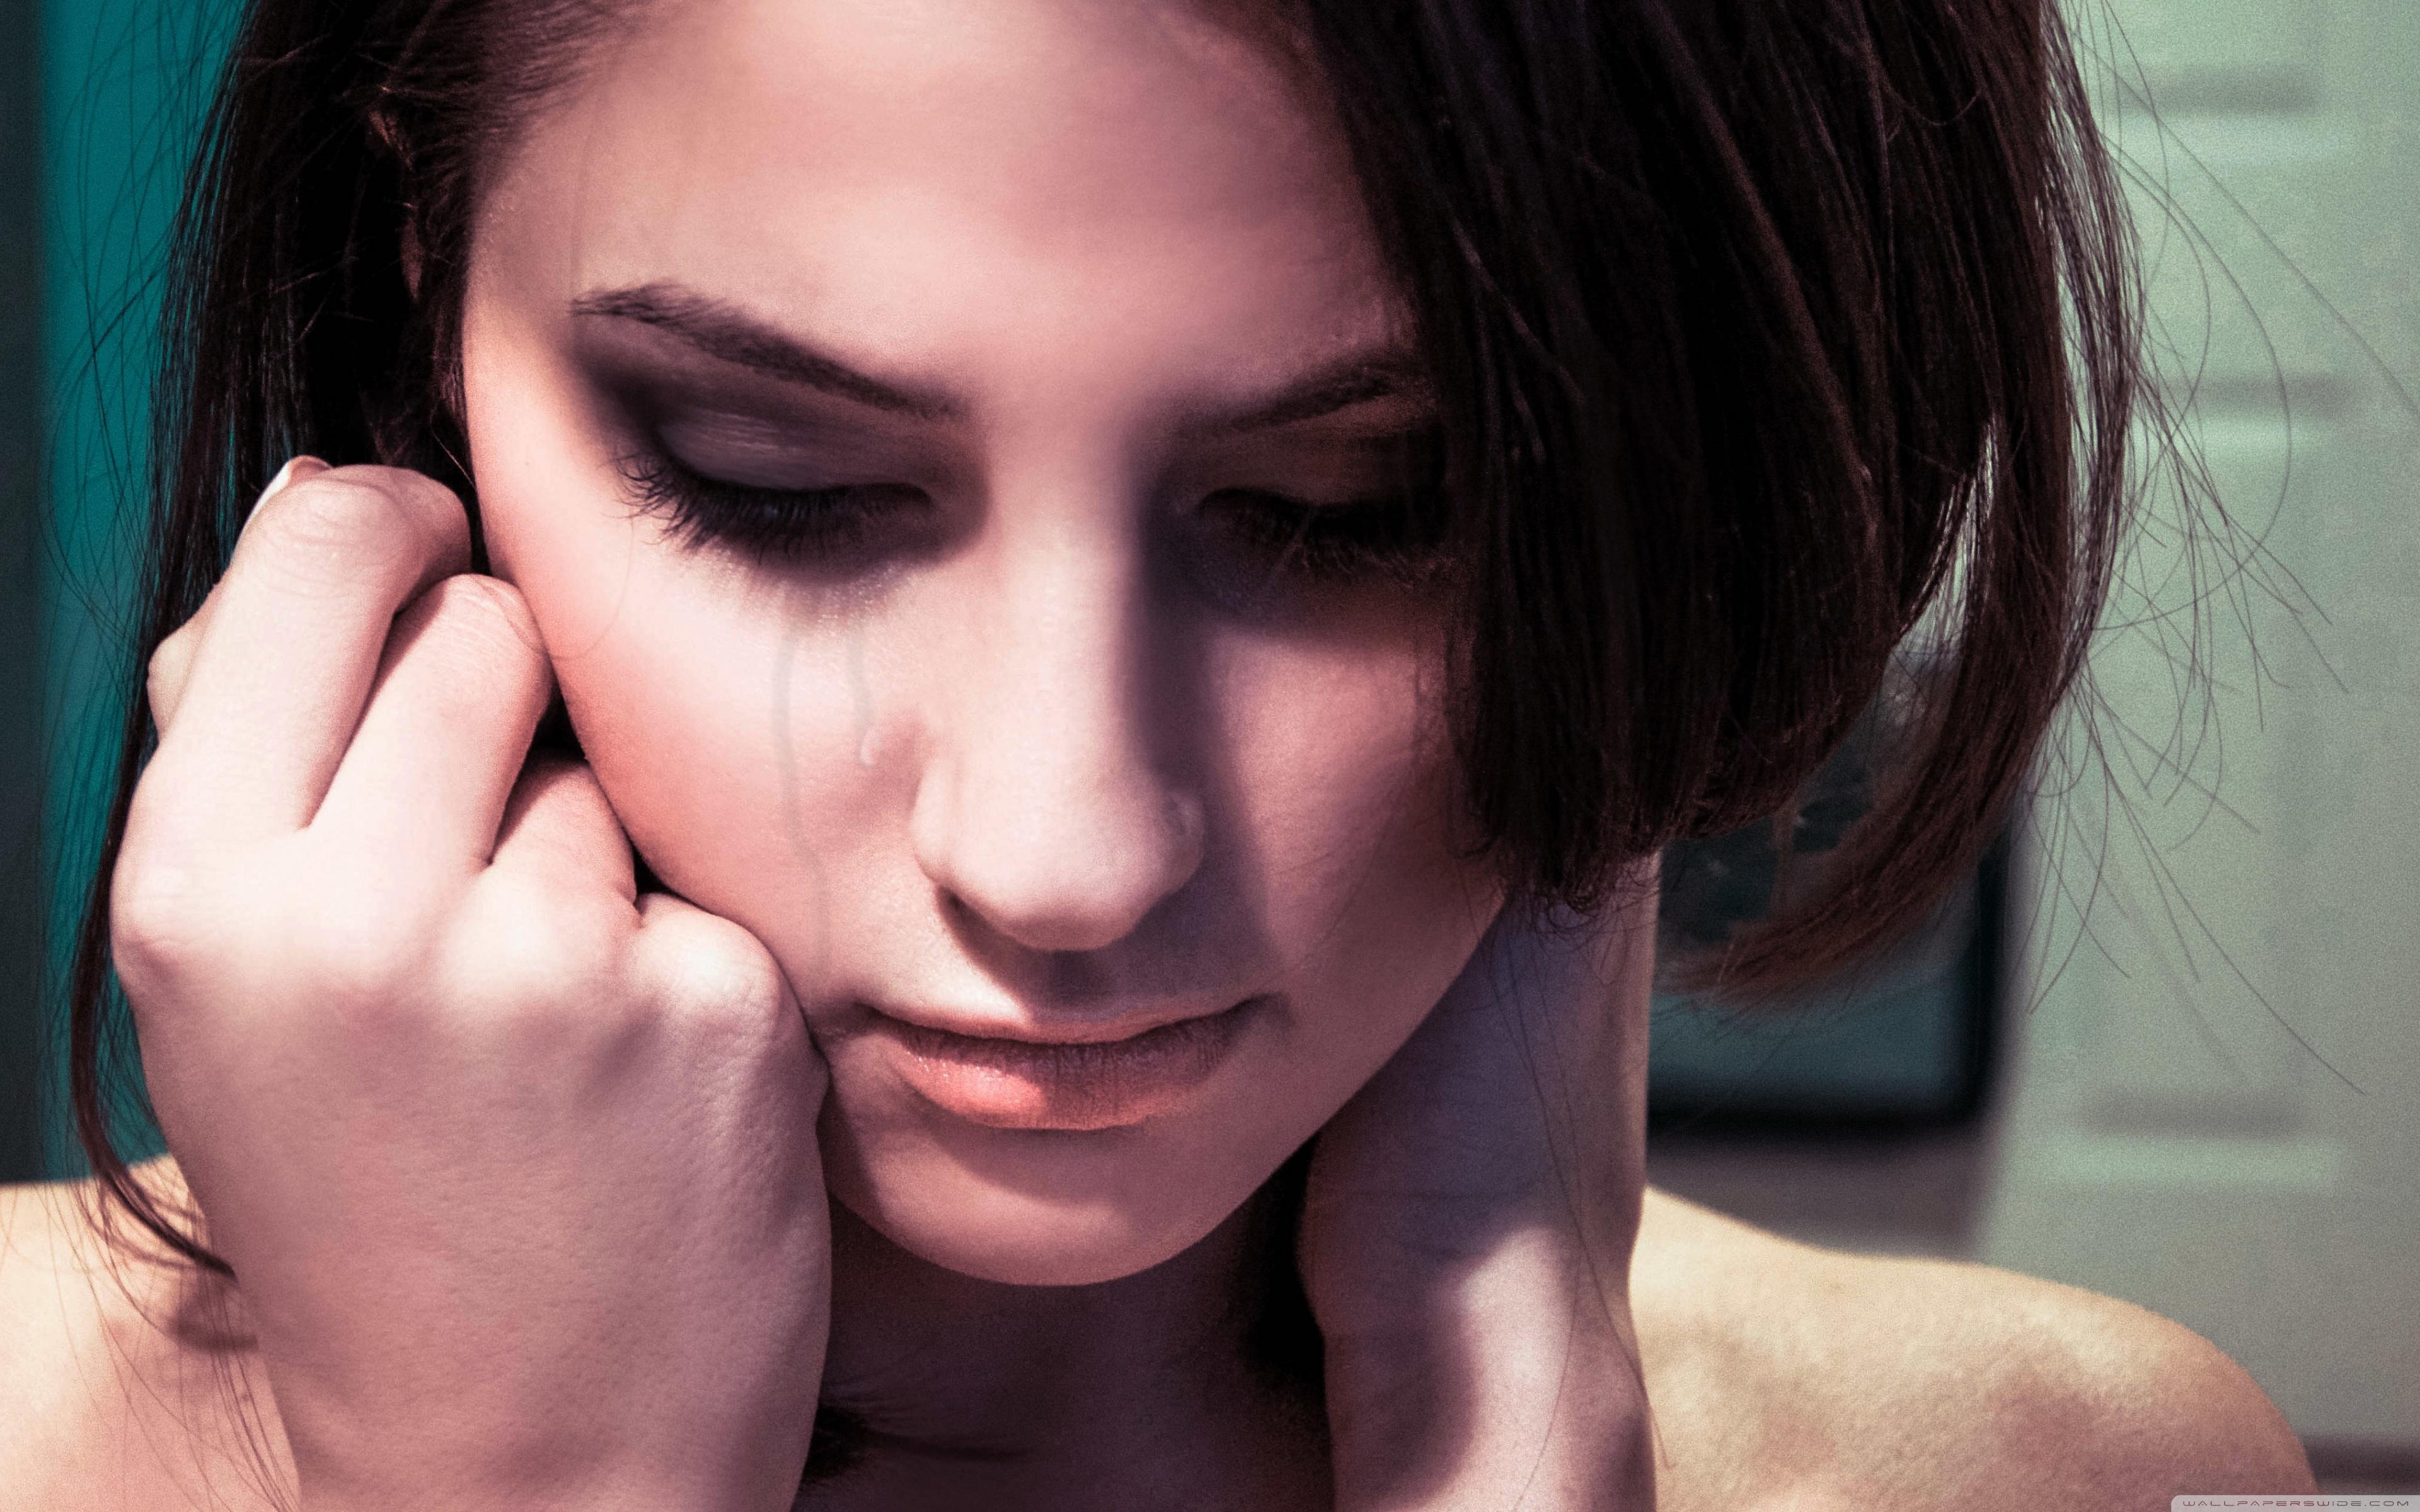 Sad Face Girl Crying ...